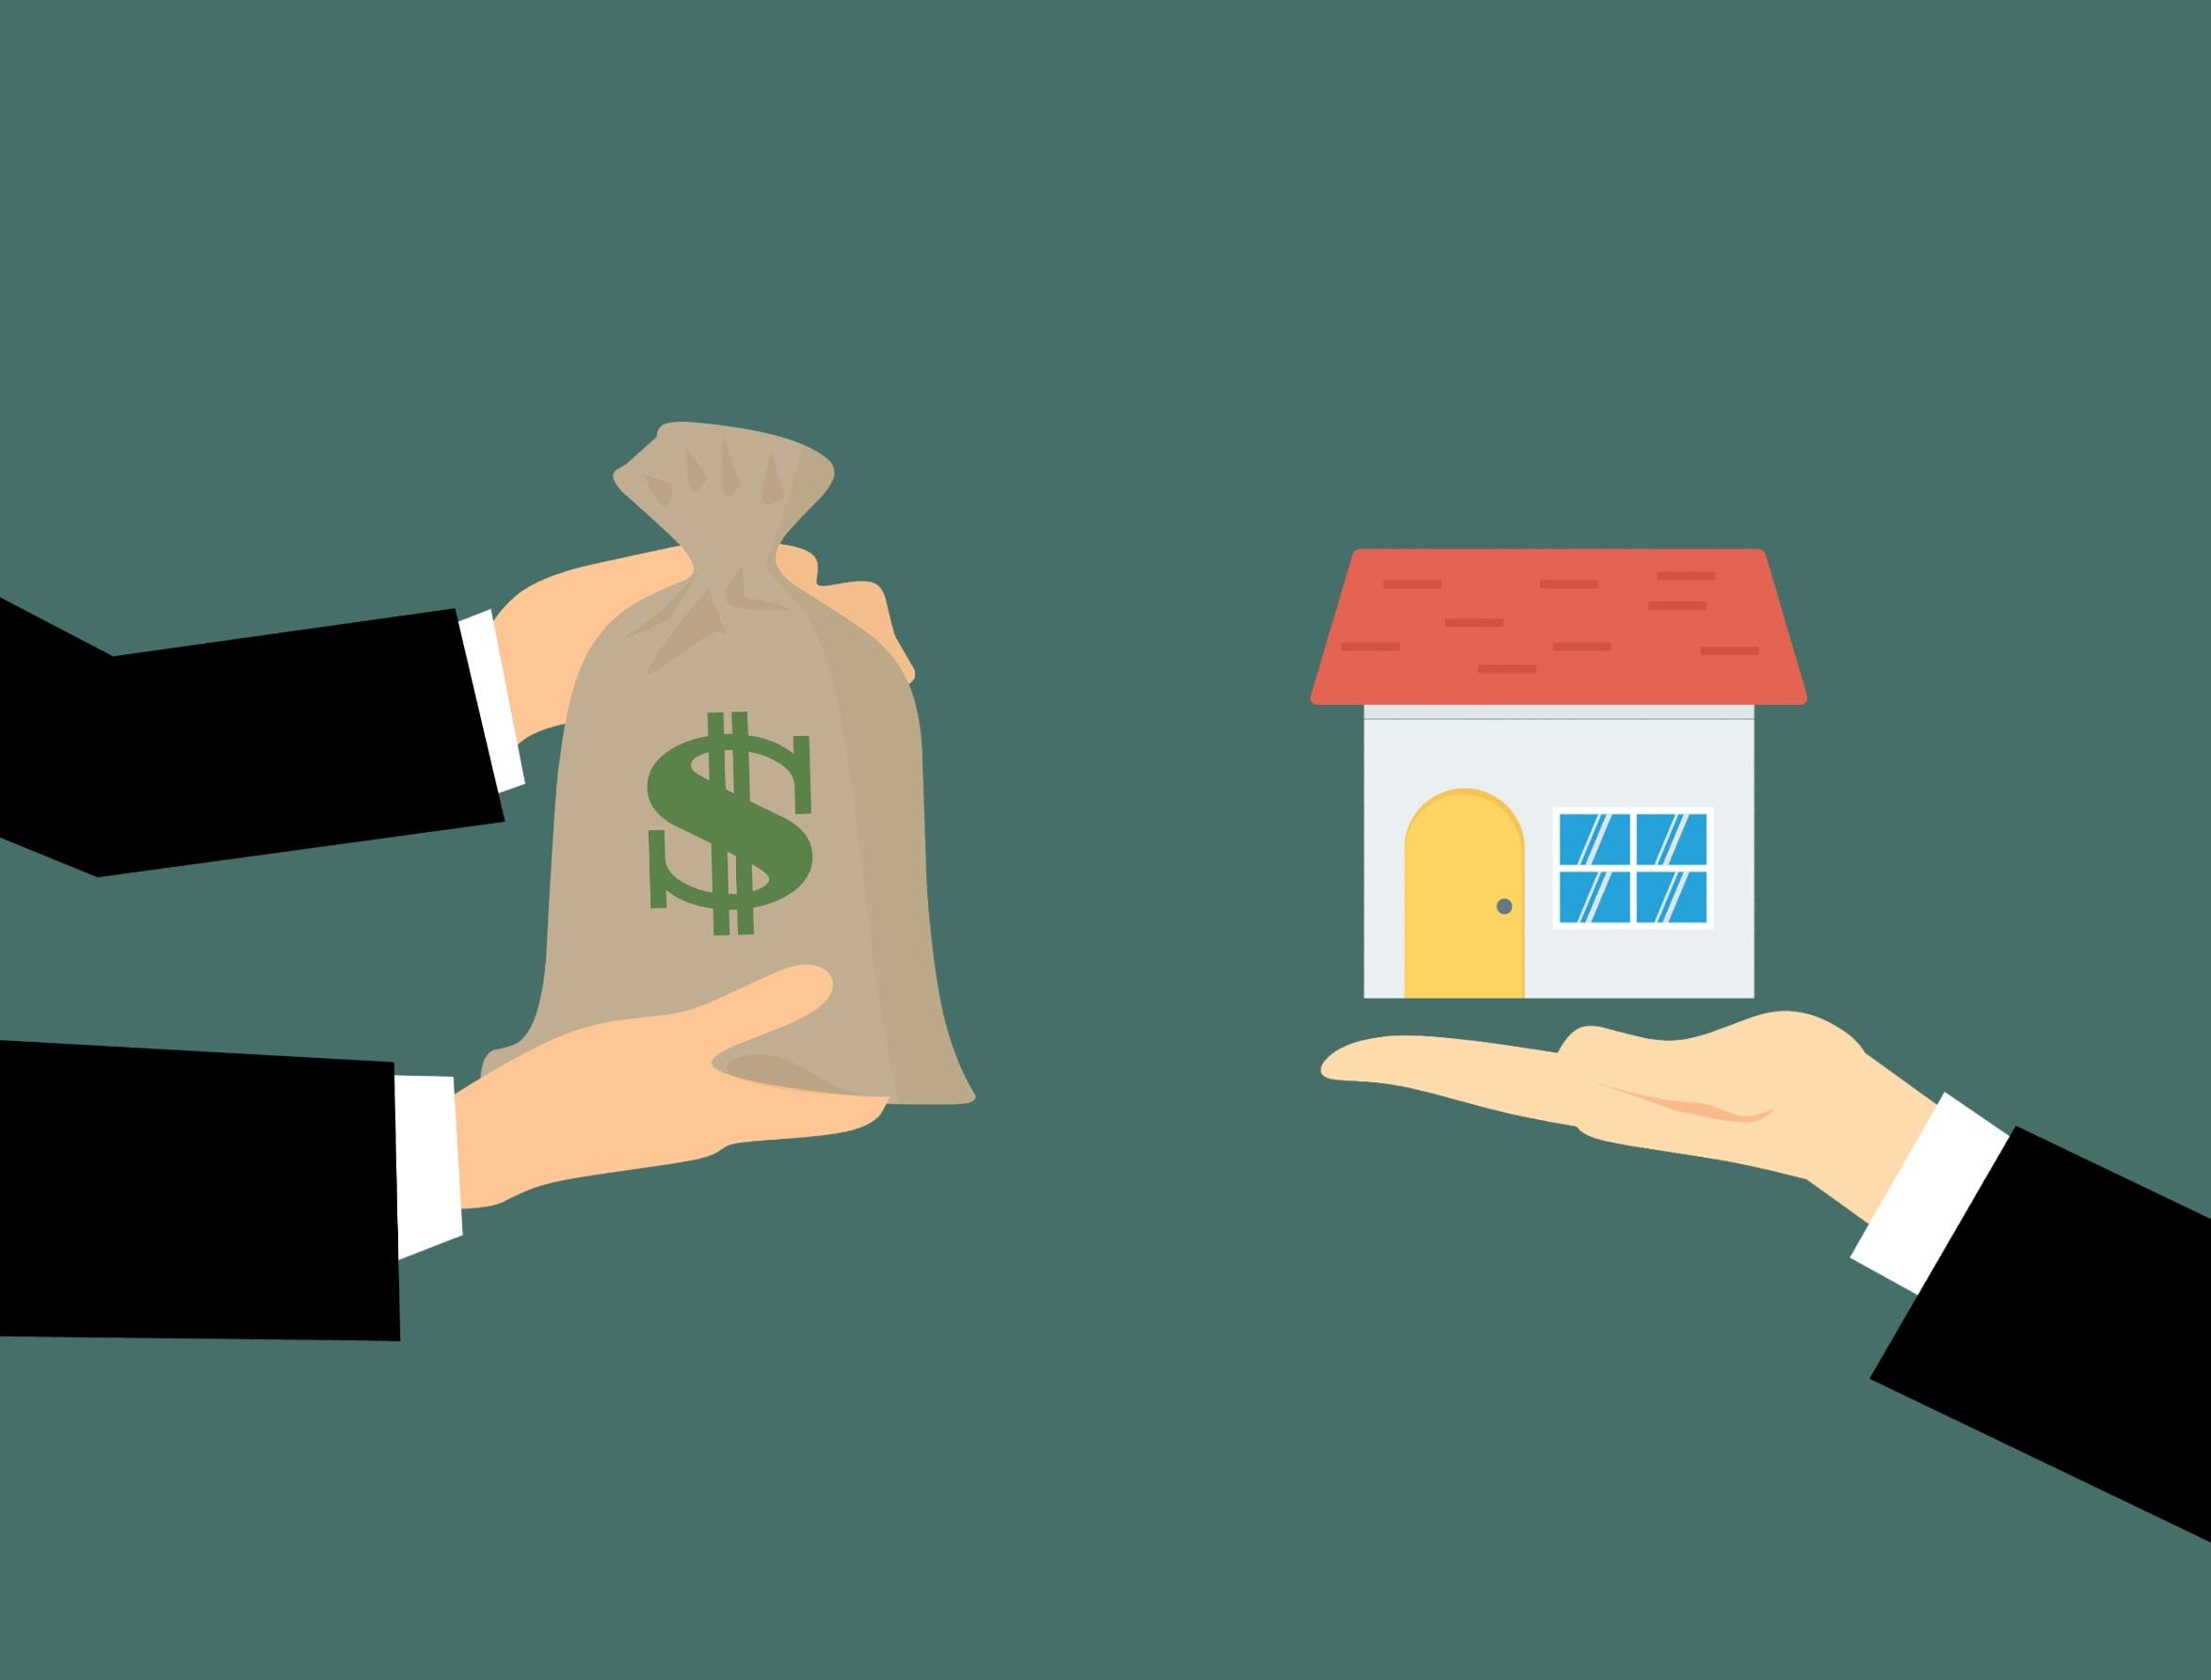 House and Money Bag Image